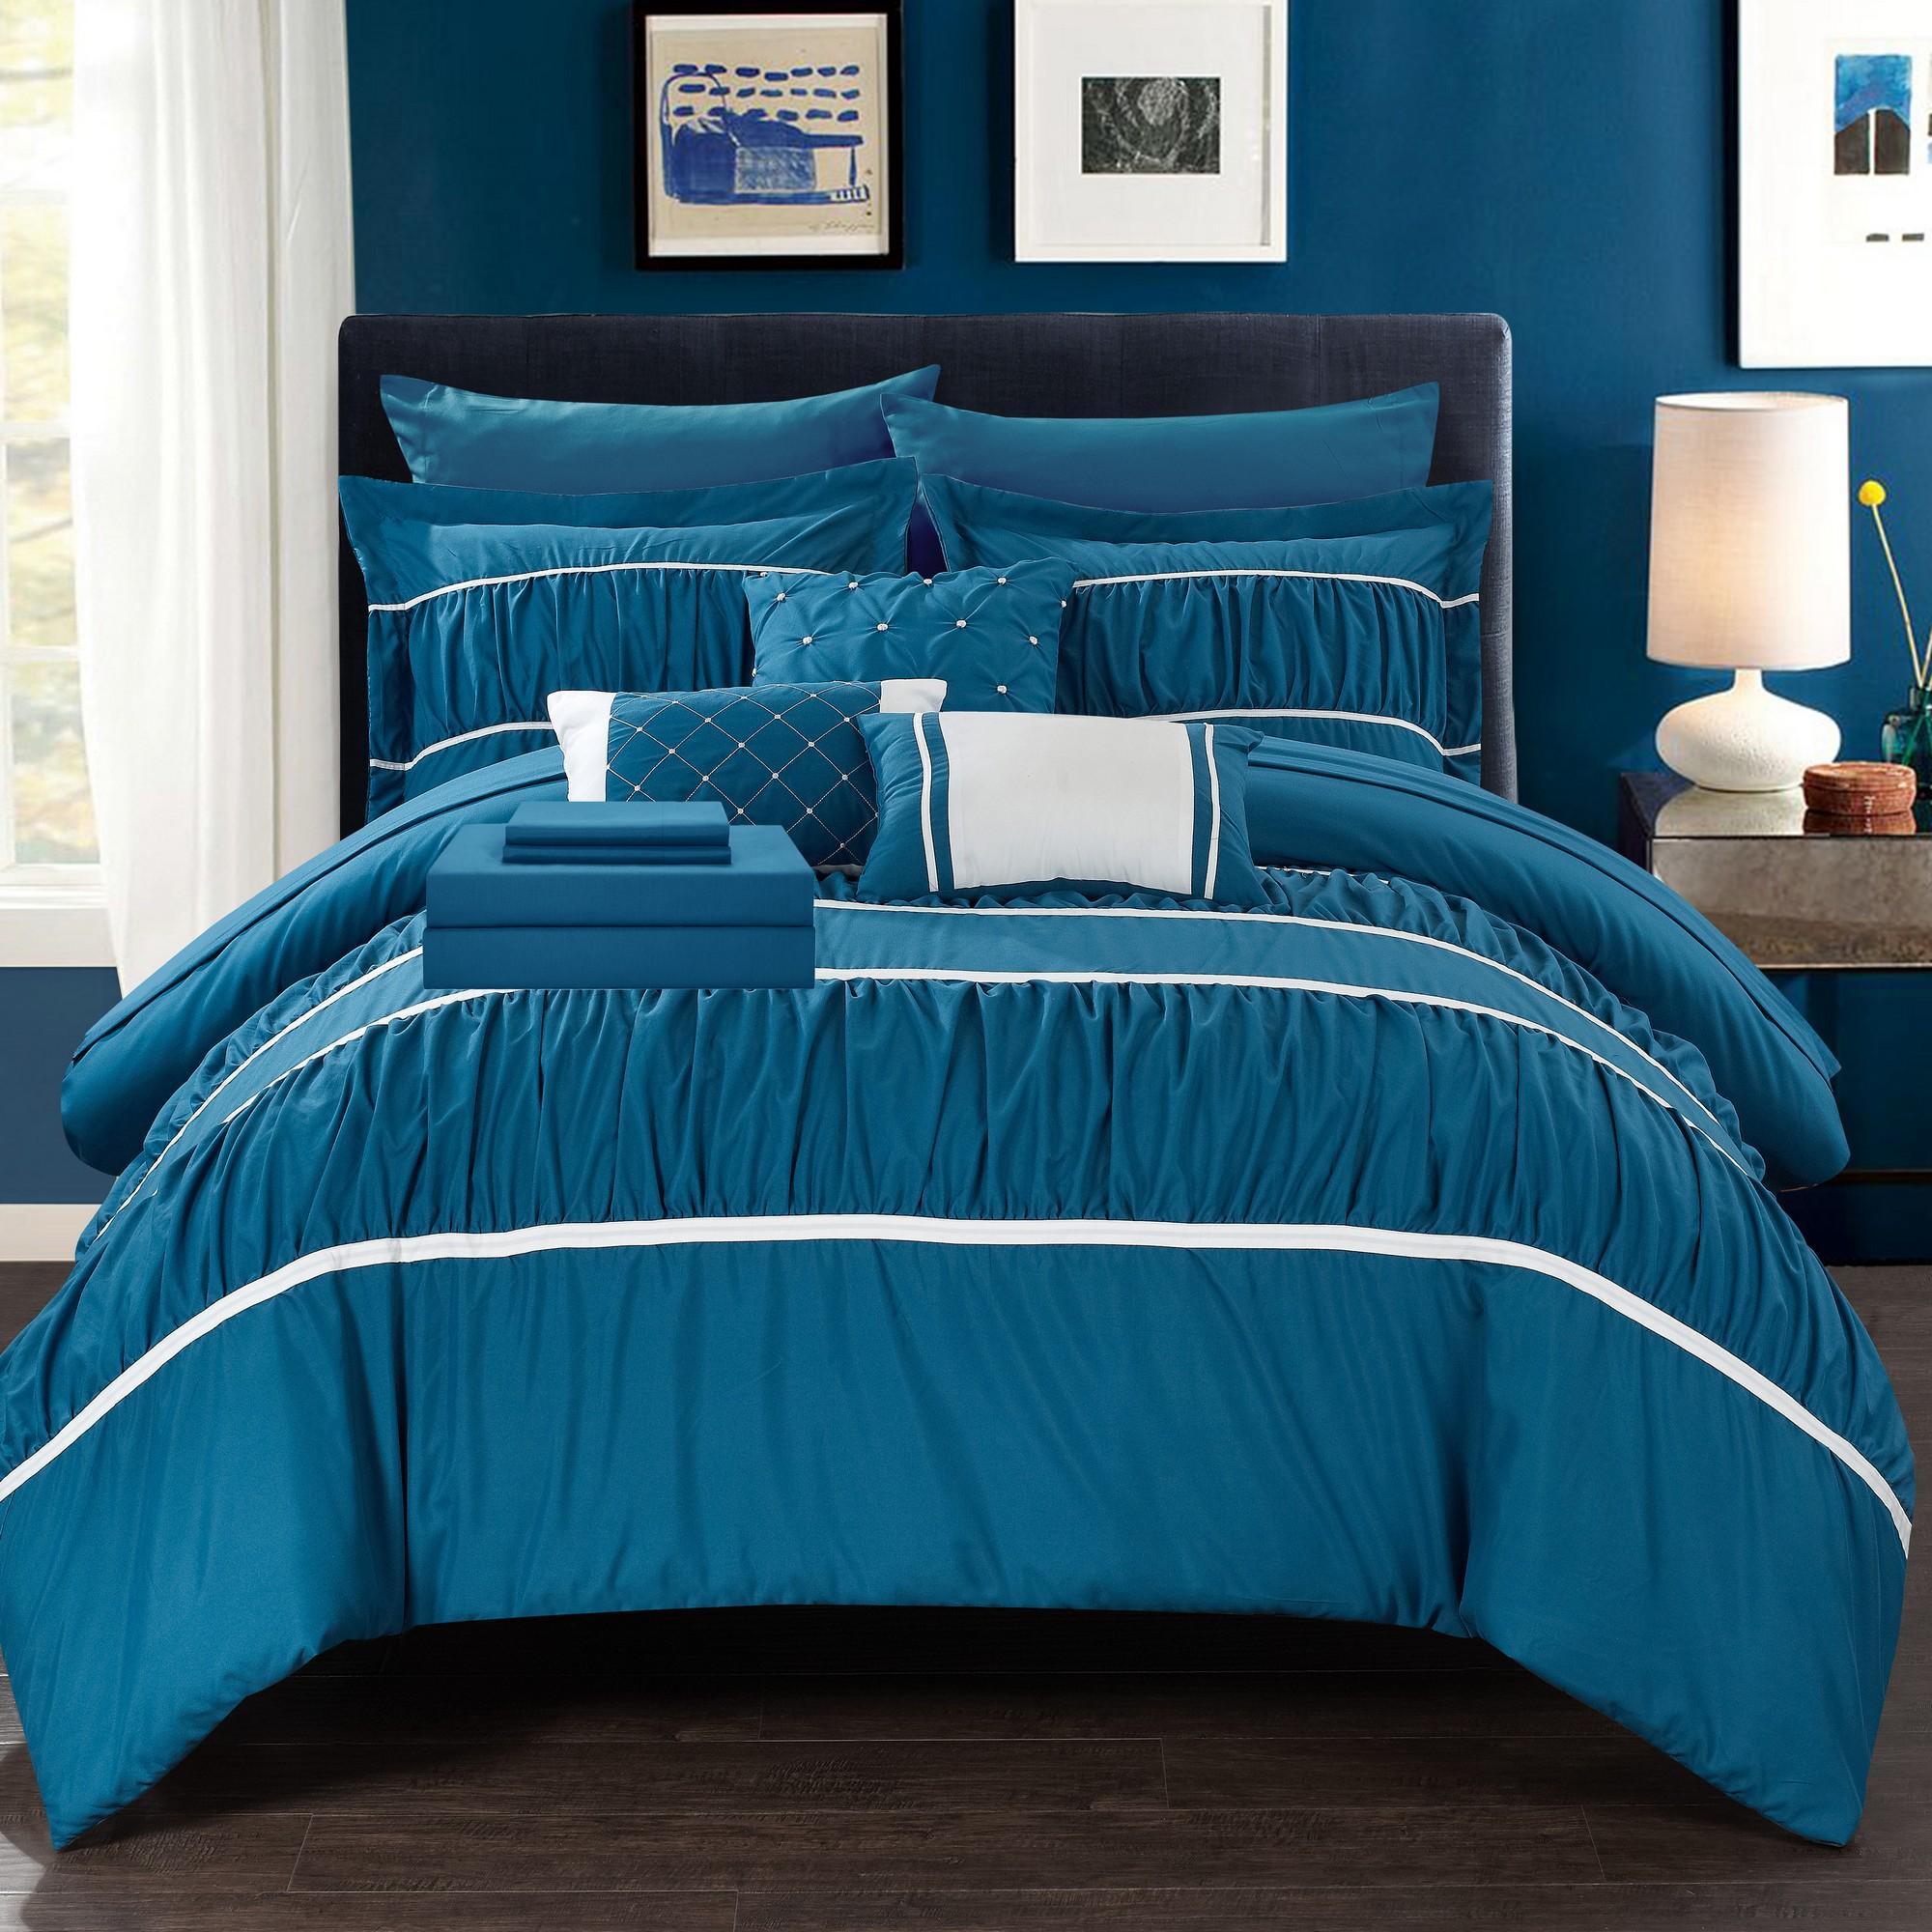 Stieg 10 Piece Comforter Bed in a Bag Sheet Set Decorative P